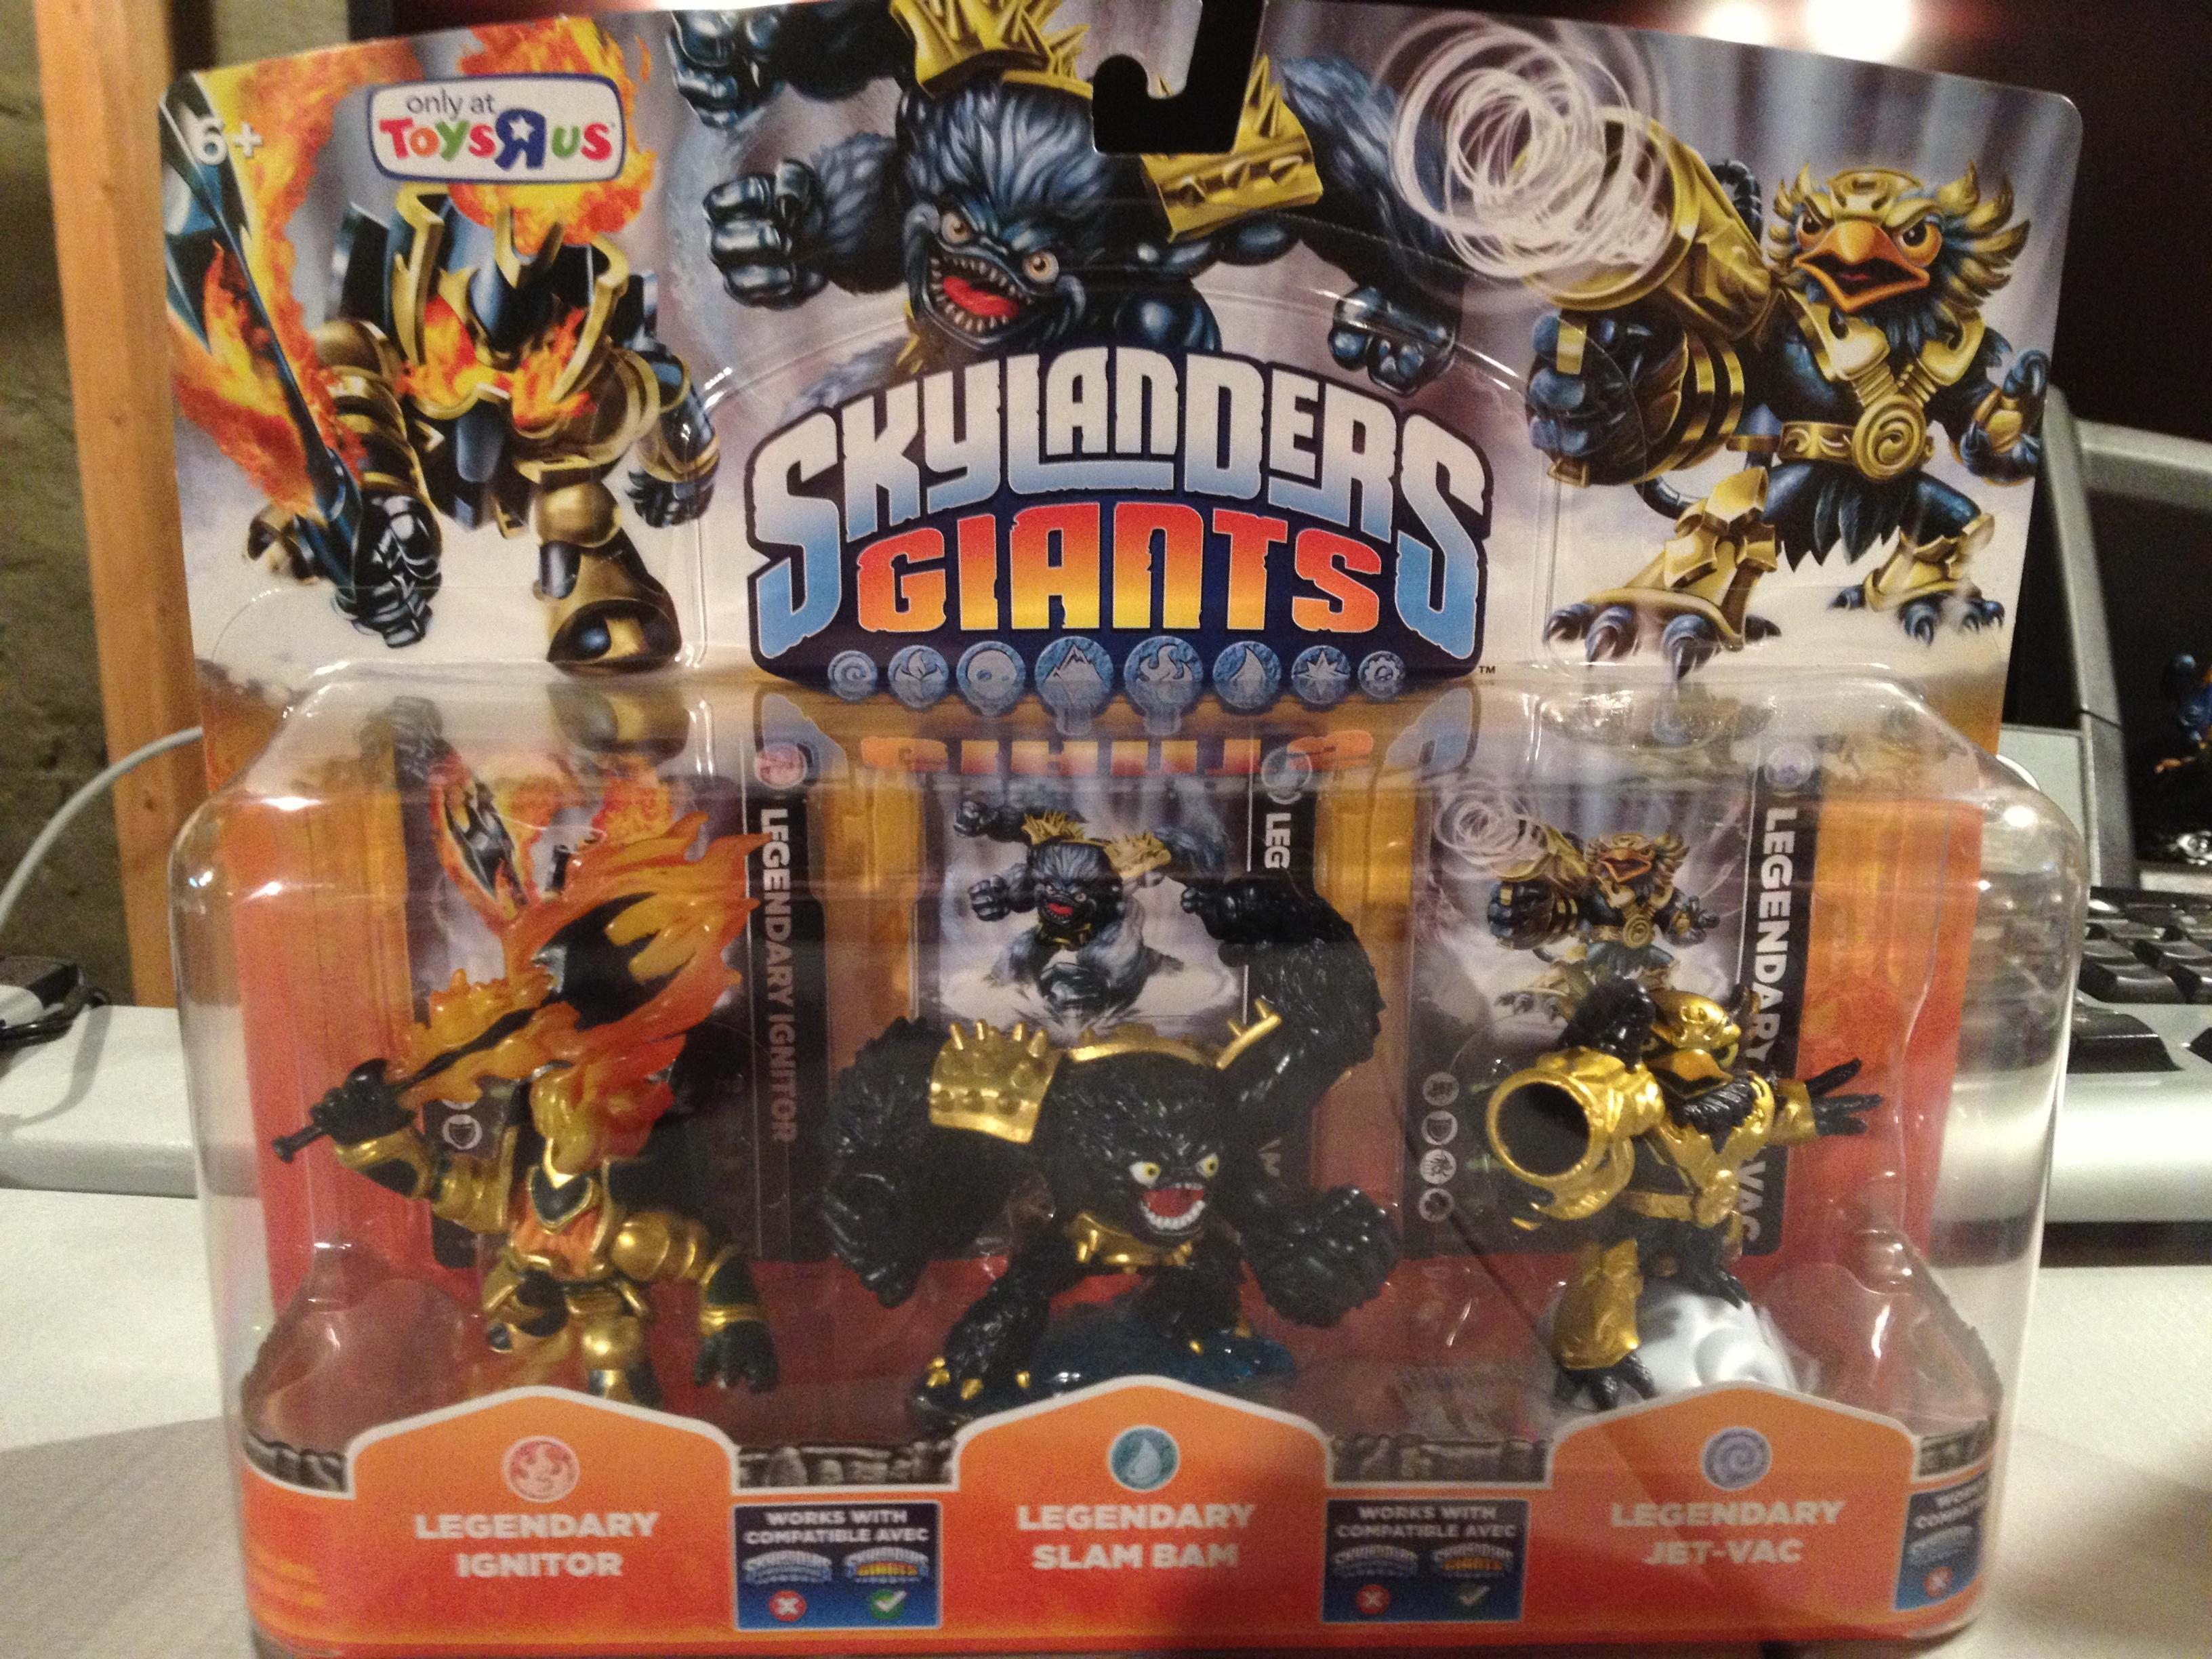 Ten Things You Don't Understand About Skylanders Giants